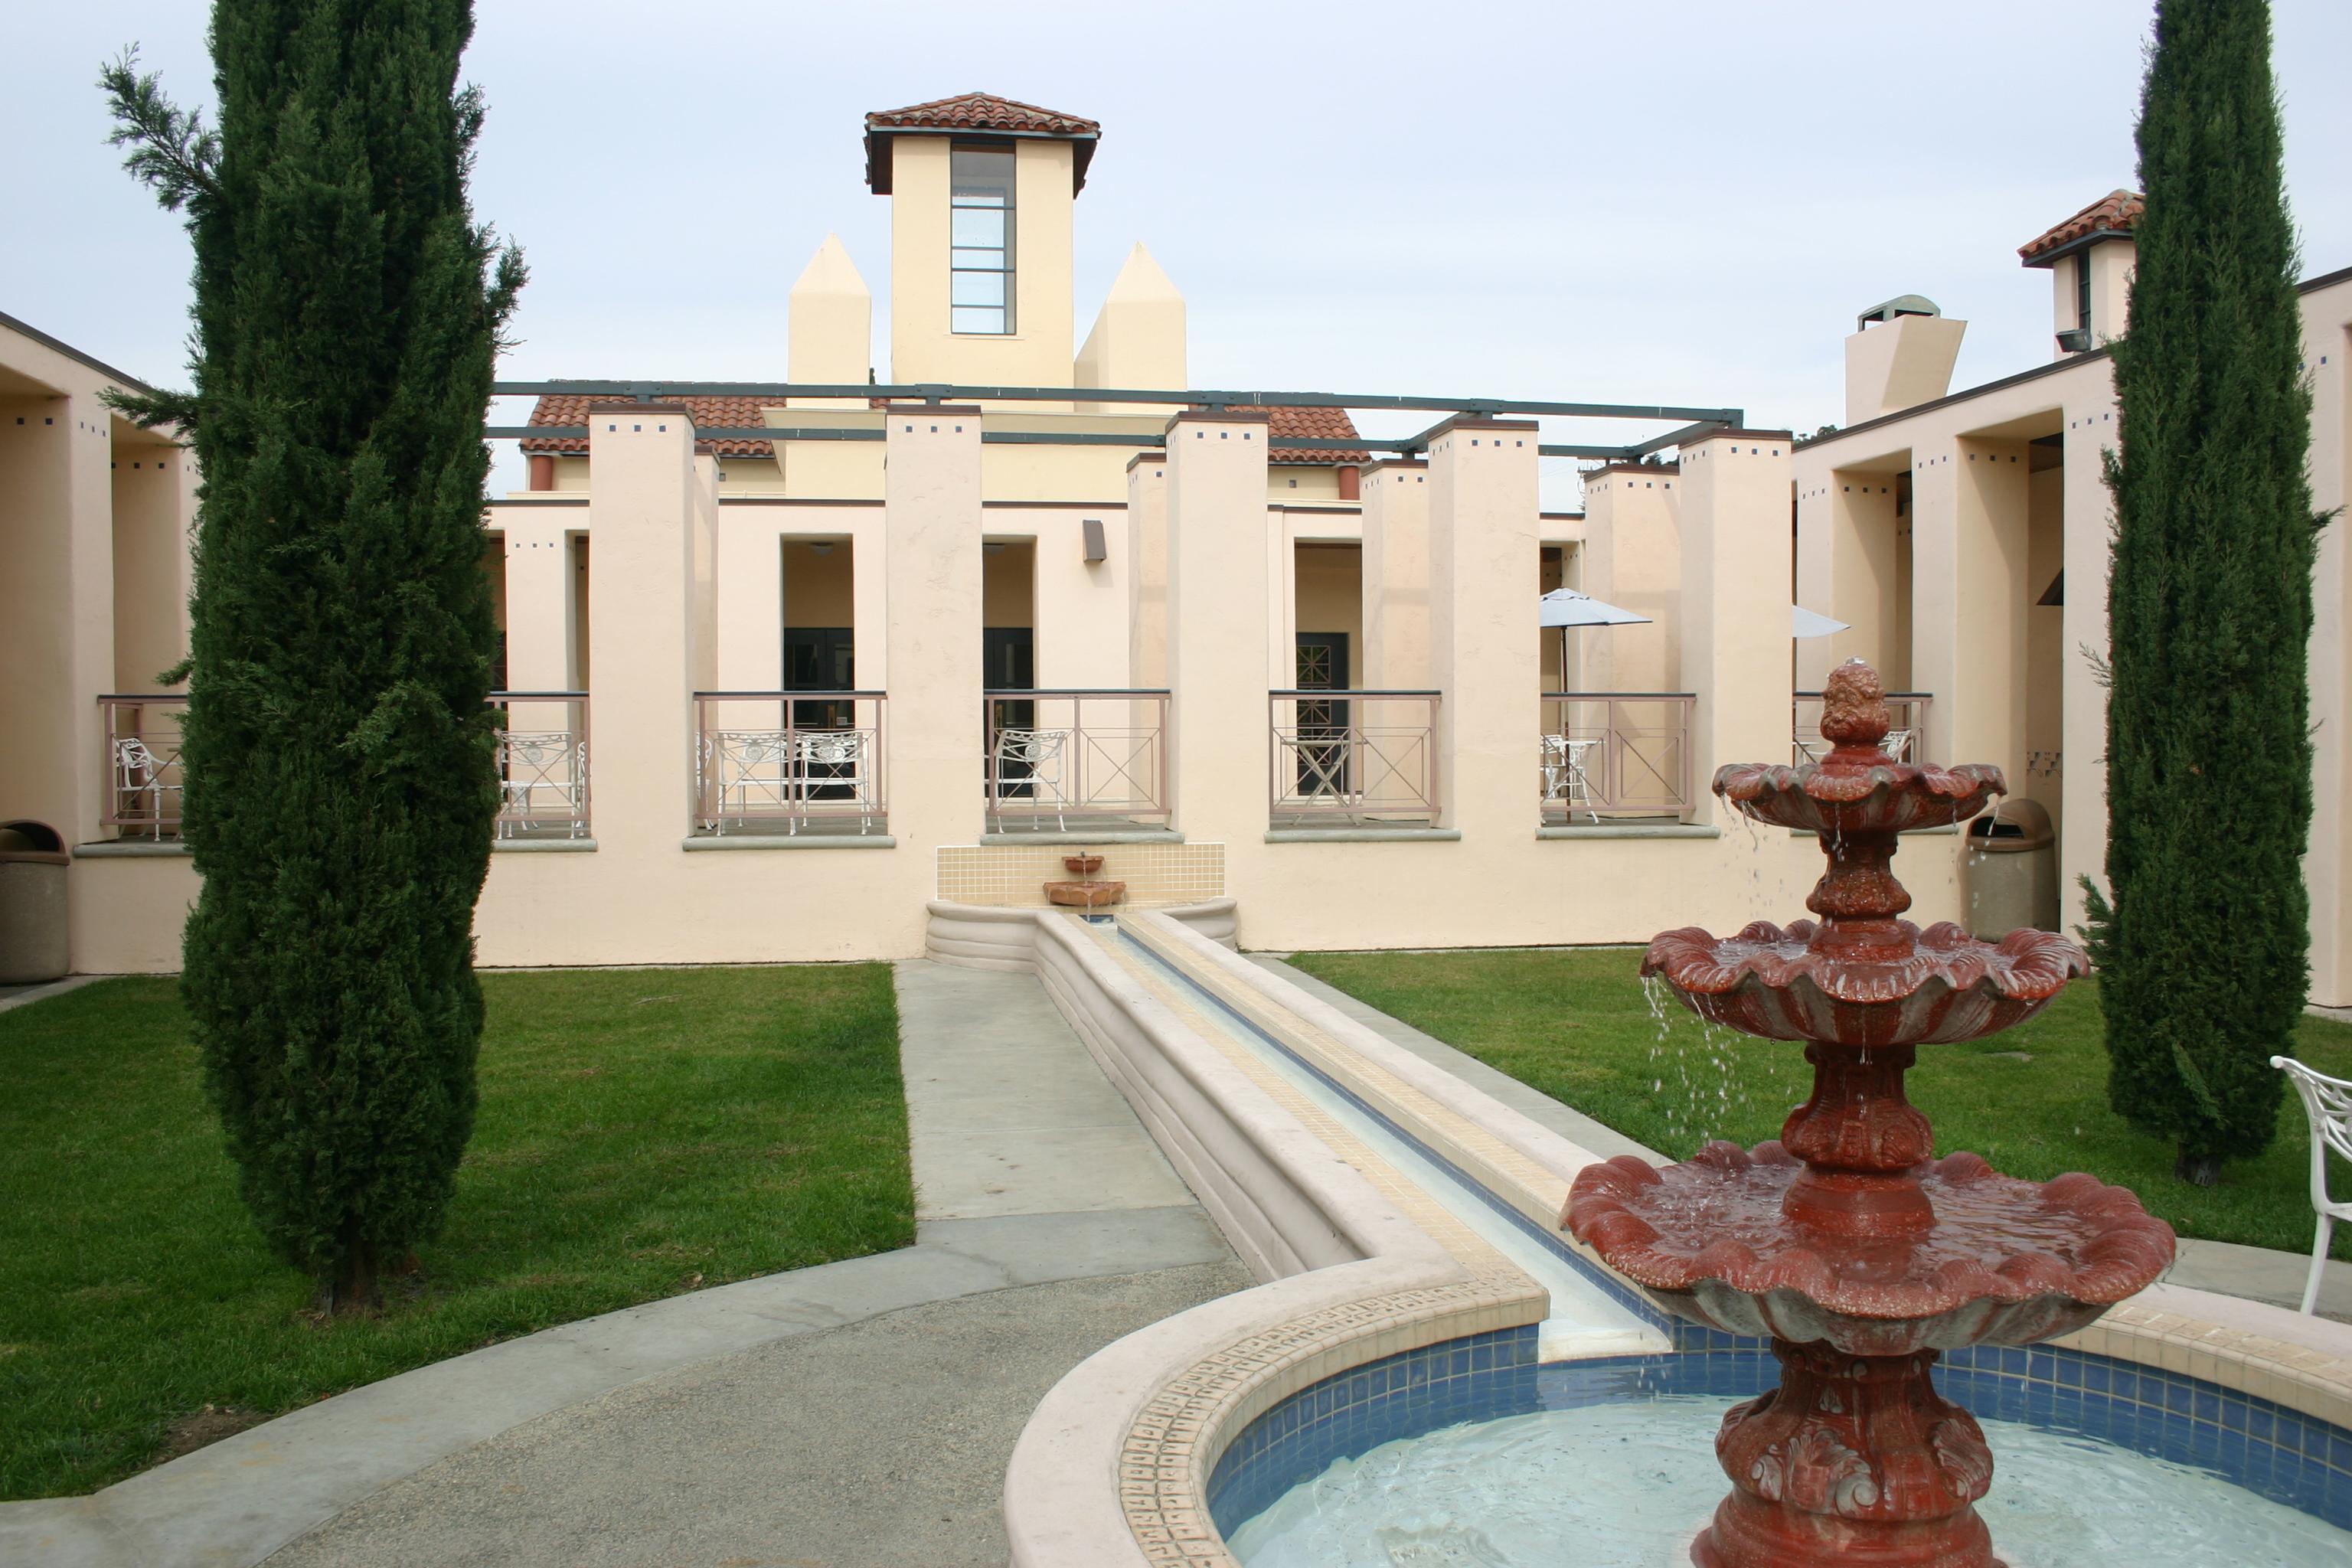 La Sala Auditorium and Courtyard at the San Juan Capistrano Library. File photo